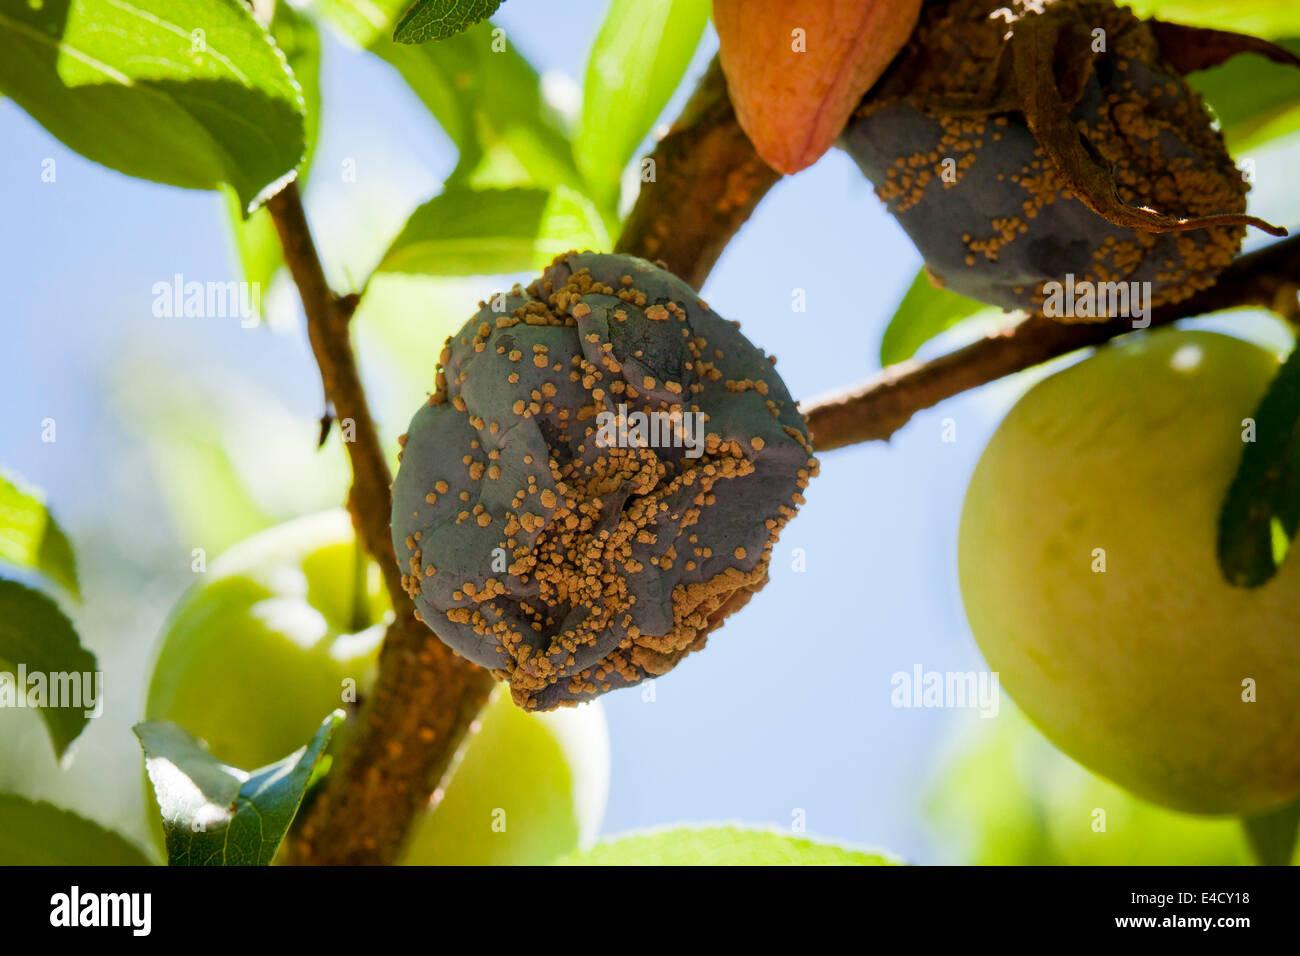 Brown rot fungal disease (Monilinia fructicola) on plums - USA - Stock Image